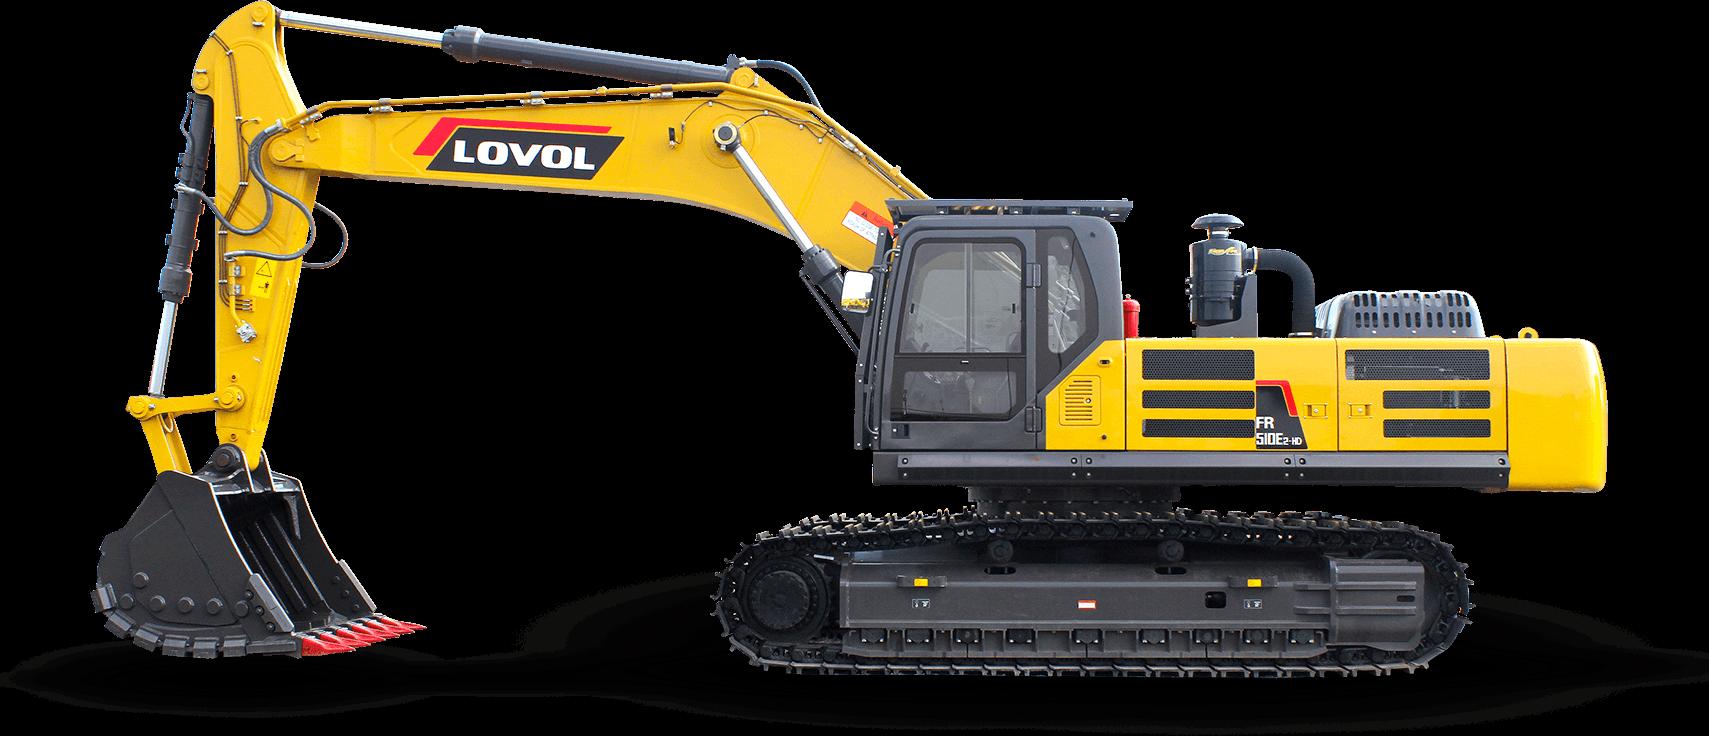 LOVOL FR510E2-HD